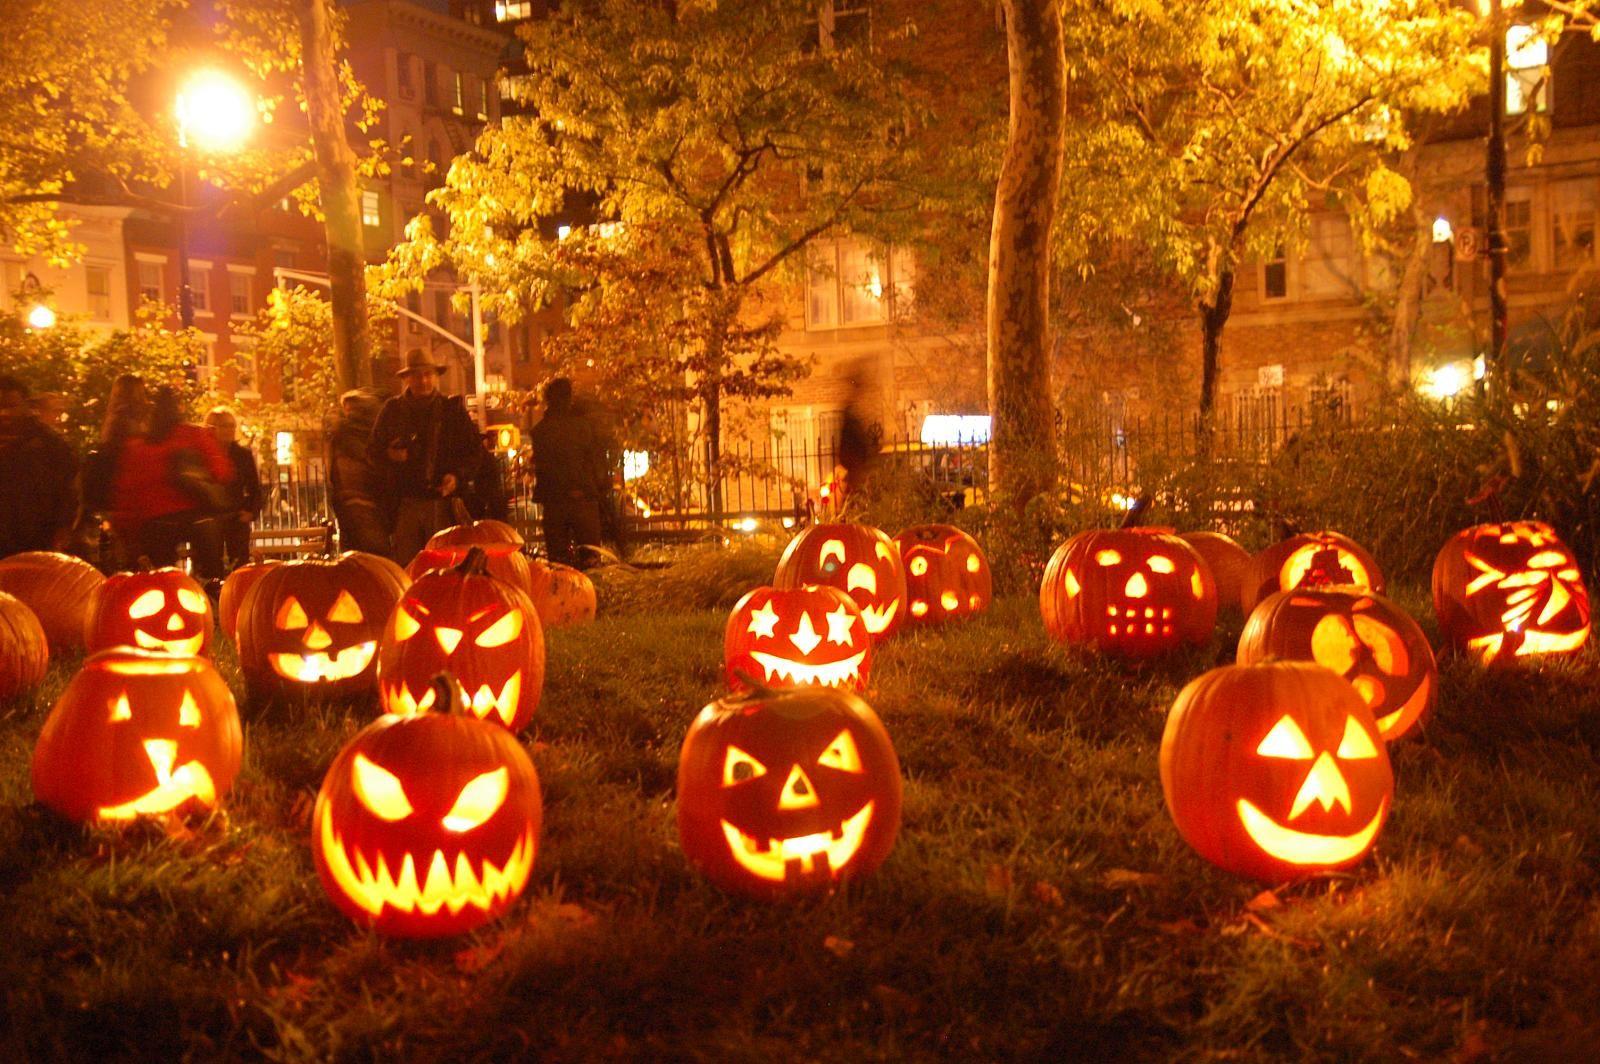 samhainophobia - fear of halloween | fear everything | pinterest